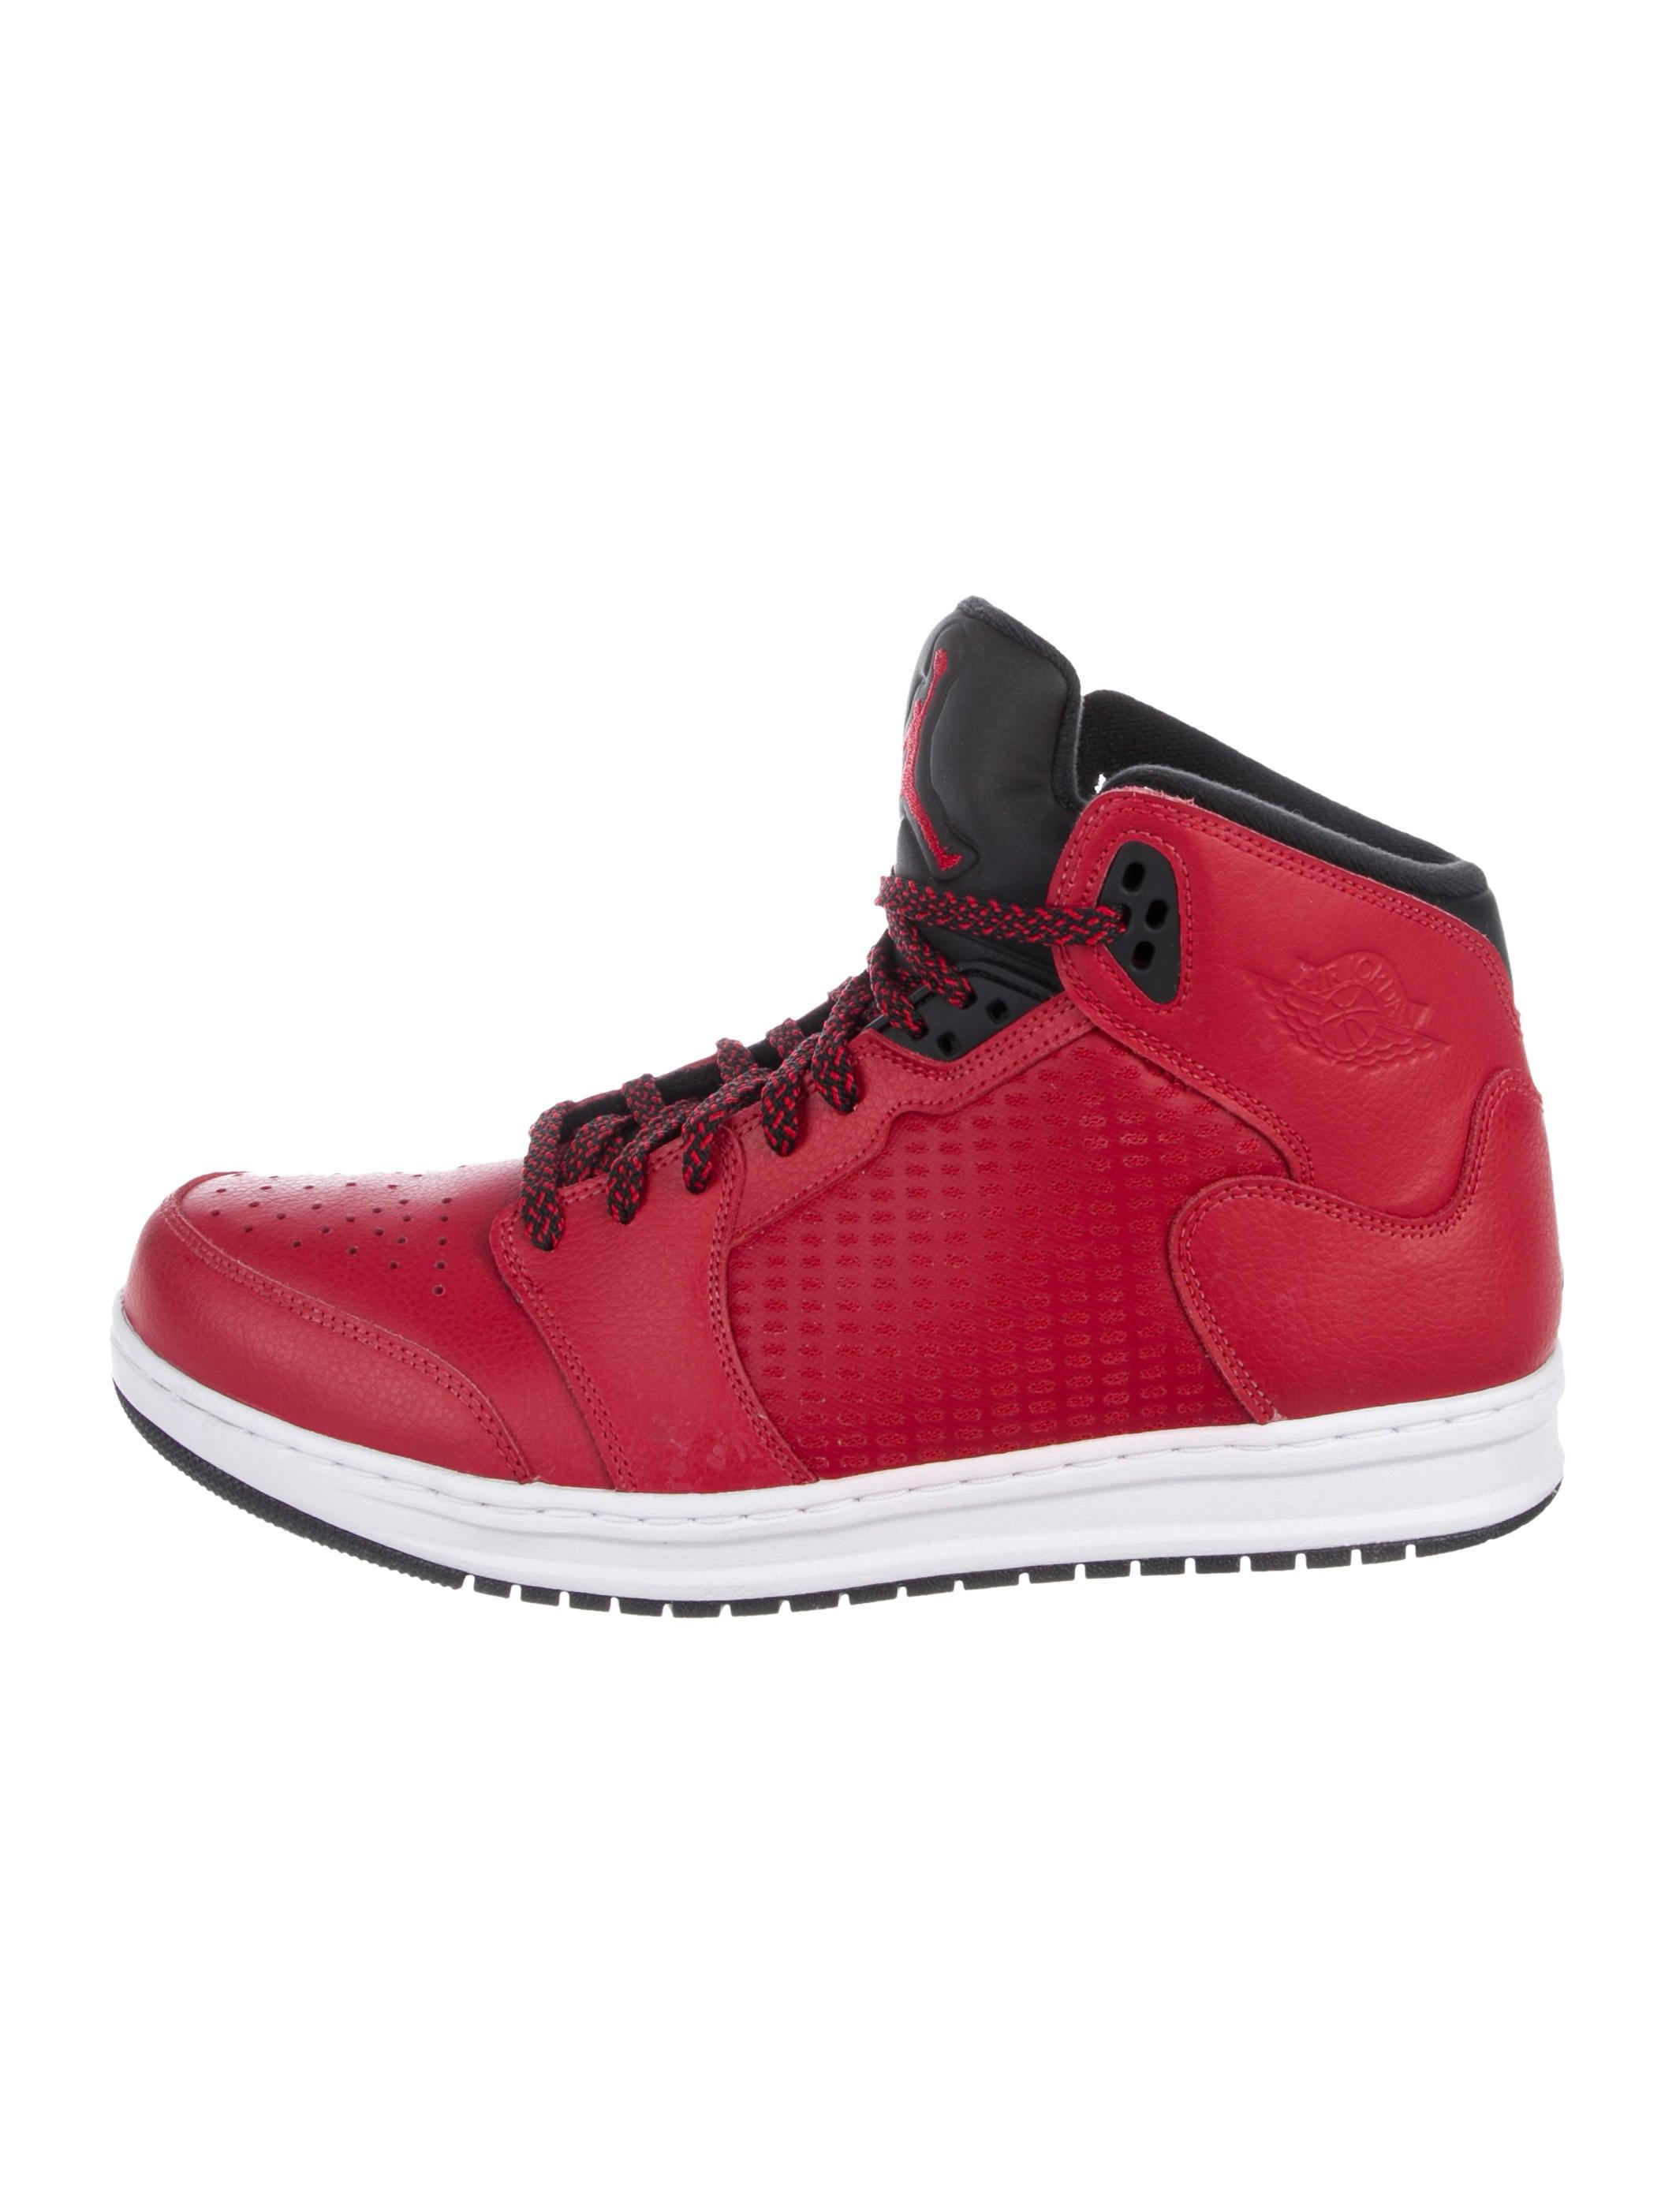 huge discount 22a06 4f777 Nike Air Jordan Prime 5 High-Top Sneakers - Shoes - WNIAJ21898   The ...